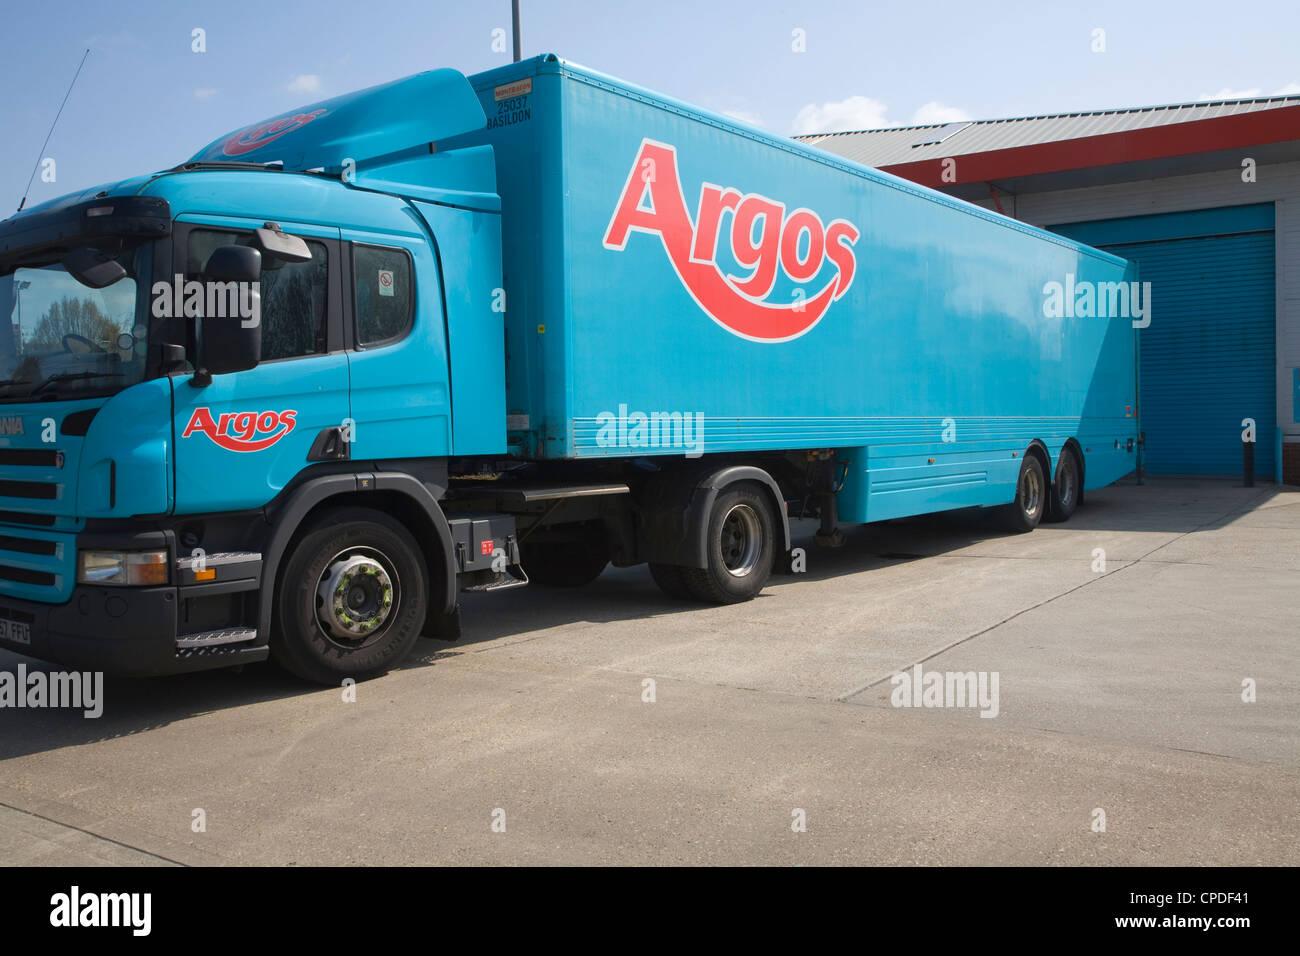 Argos delivery HGV lorry vehicle trailer UK - Stock Image